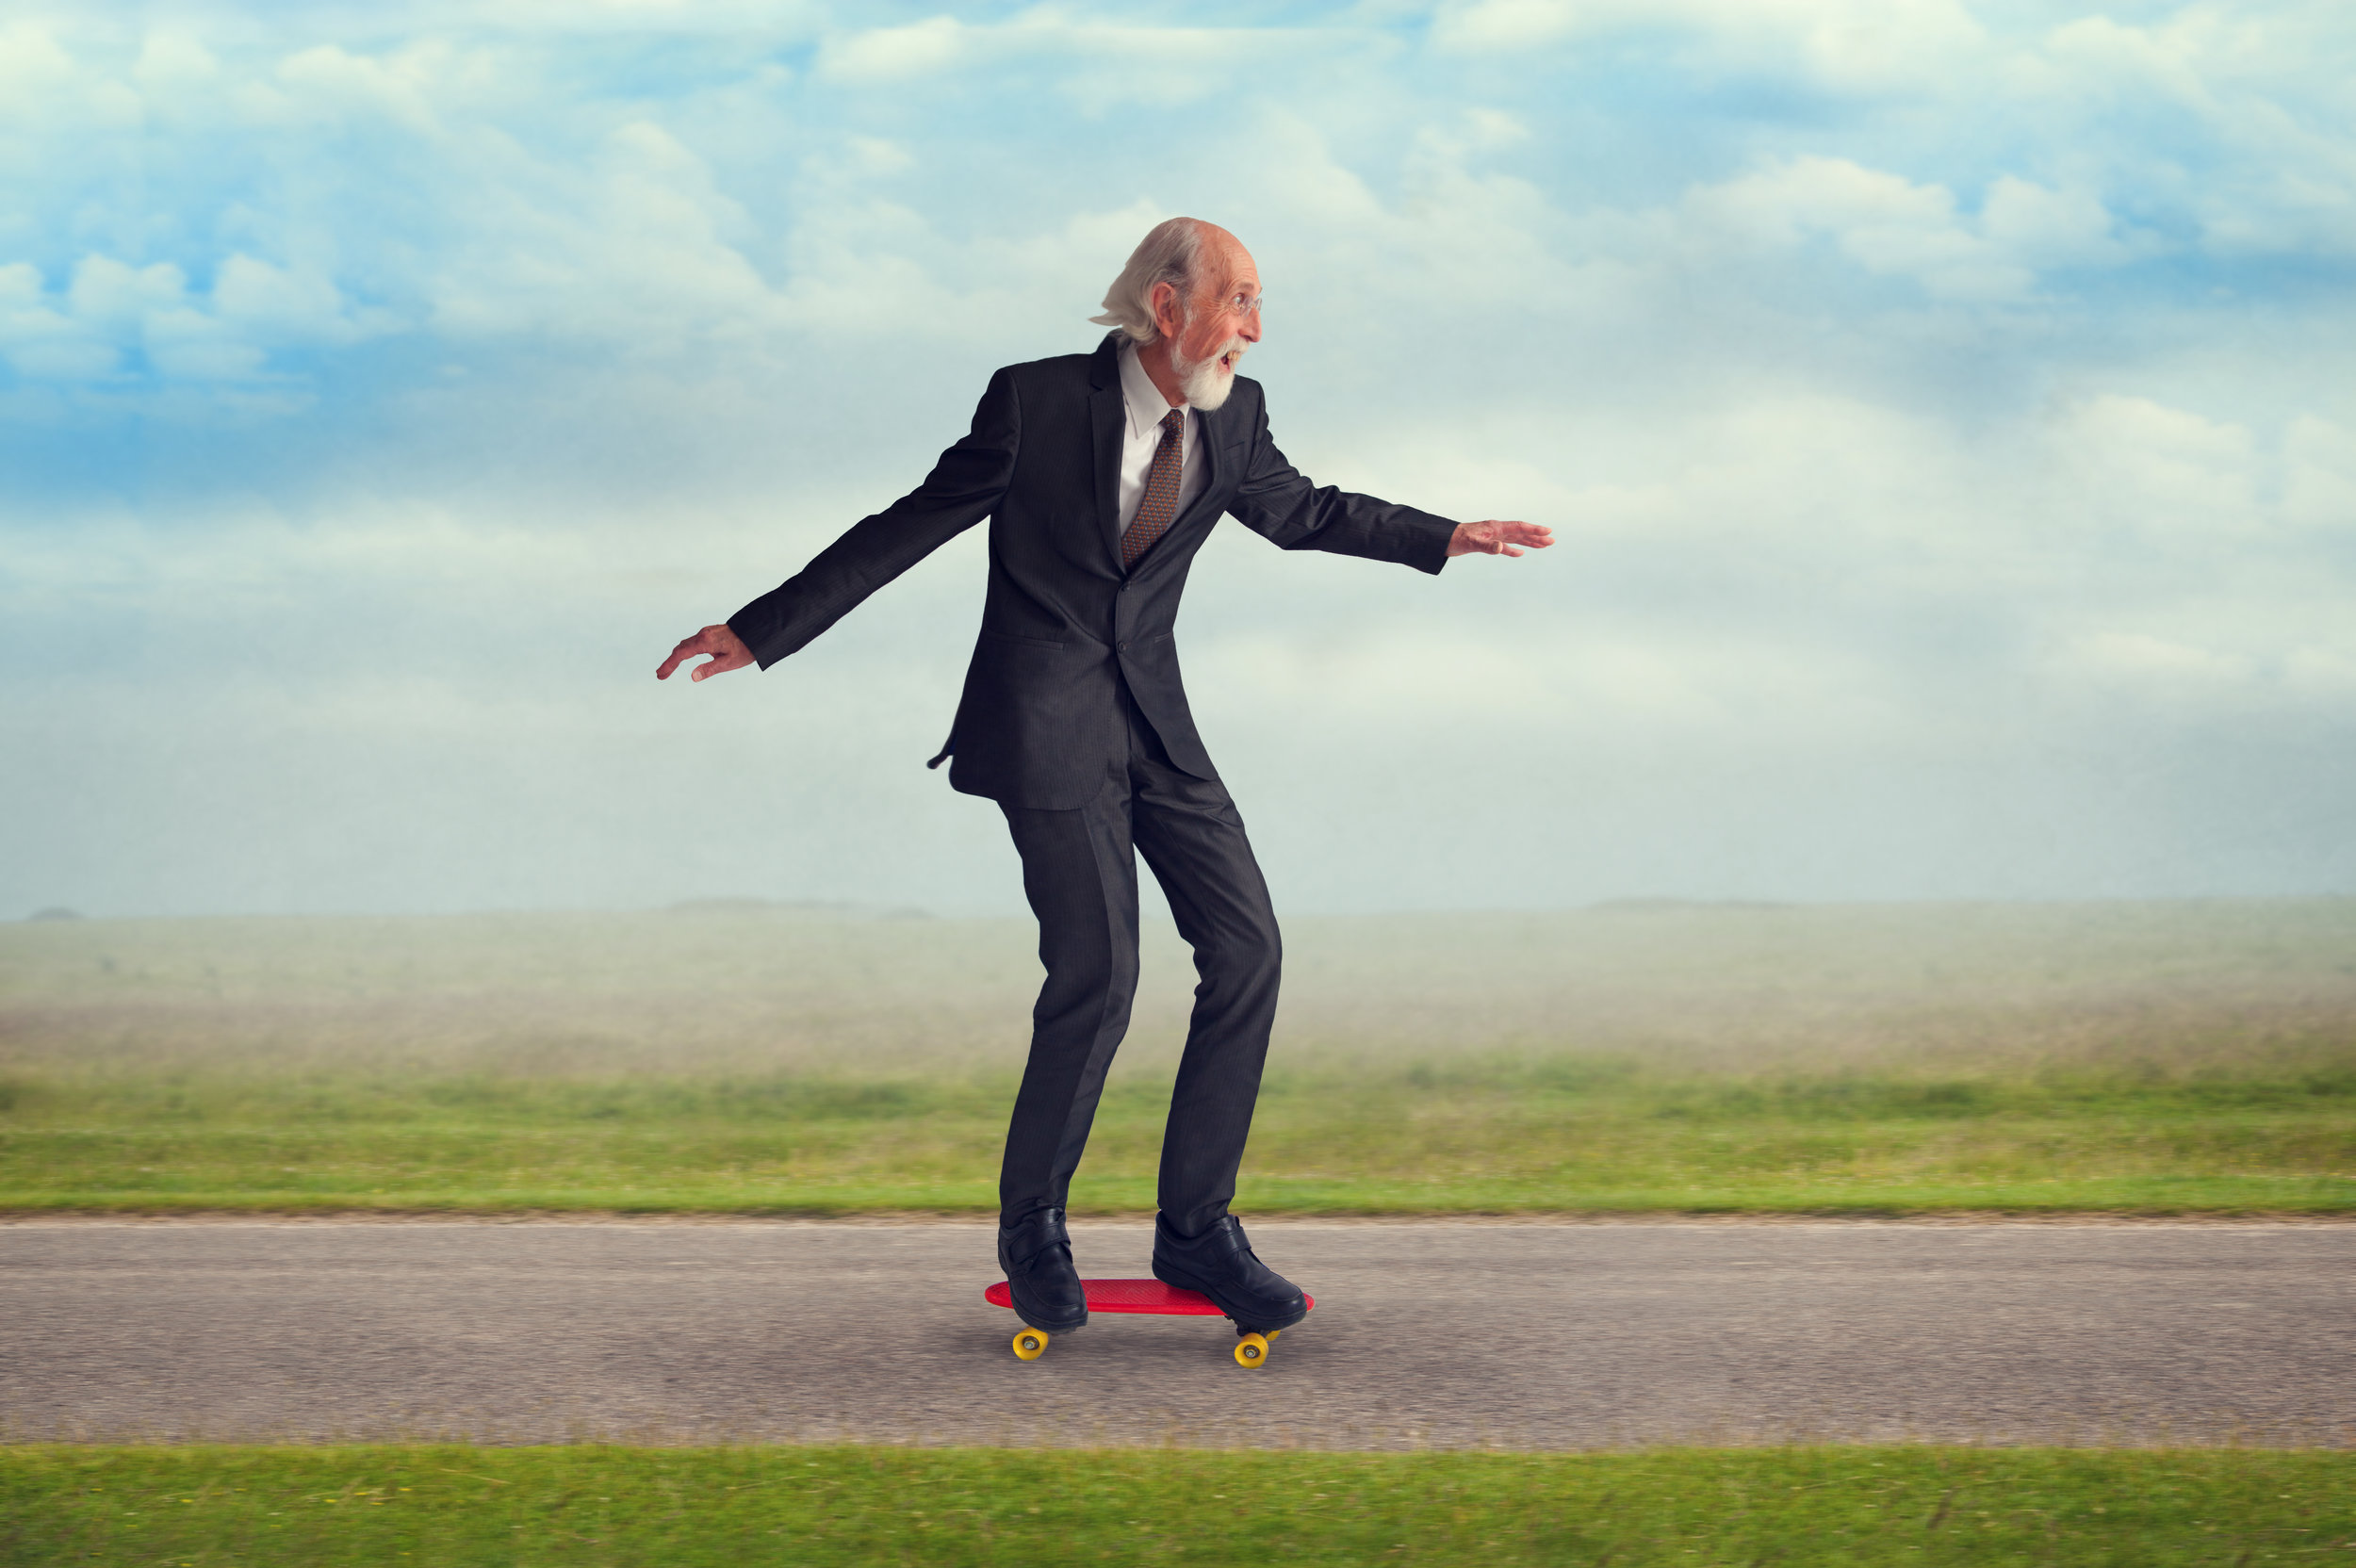 039914277-senior-man-riding-skateboard.jpeg